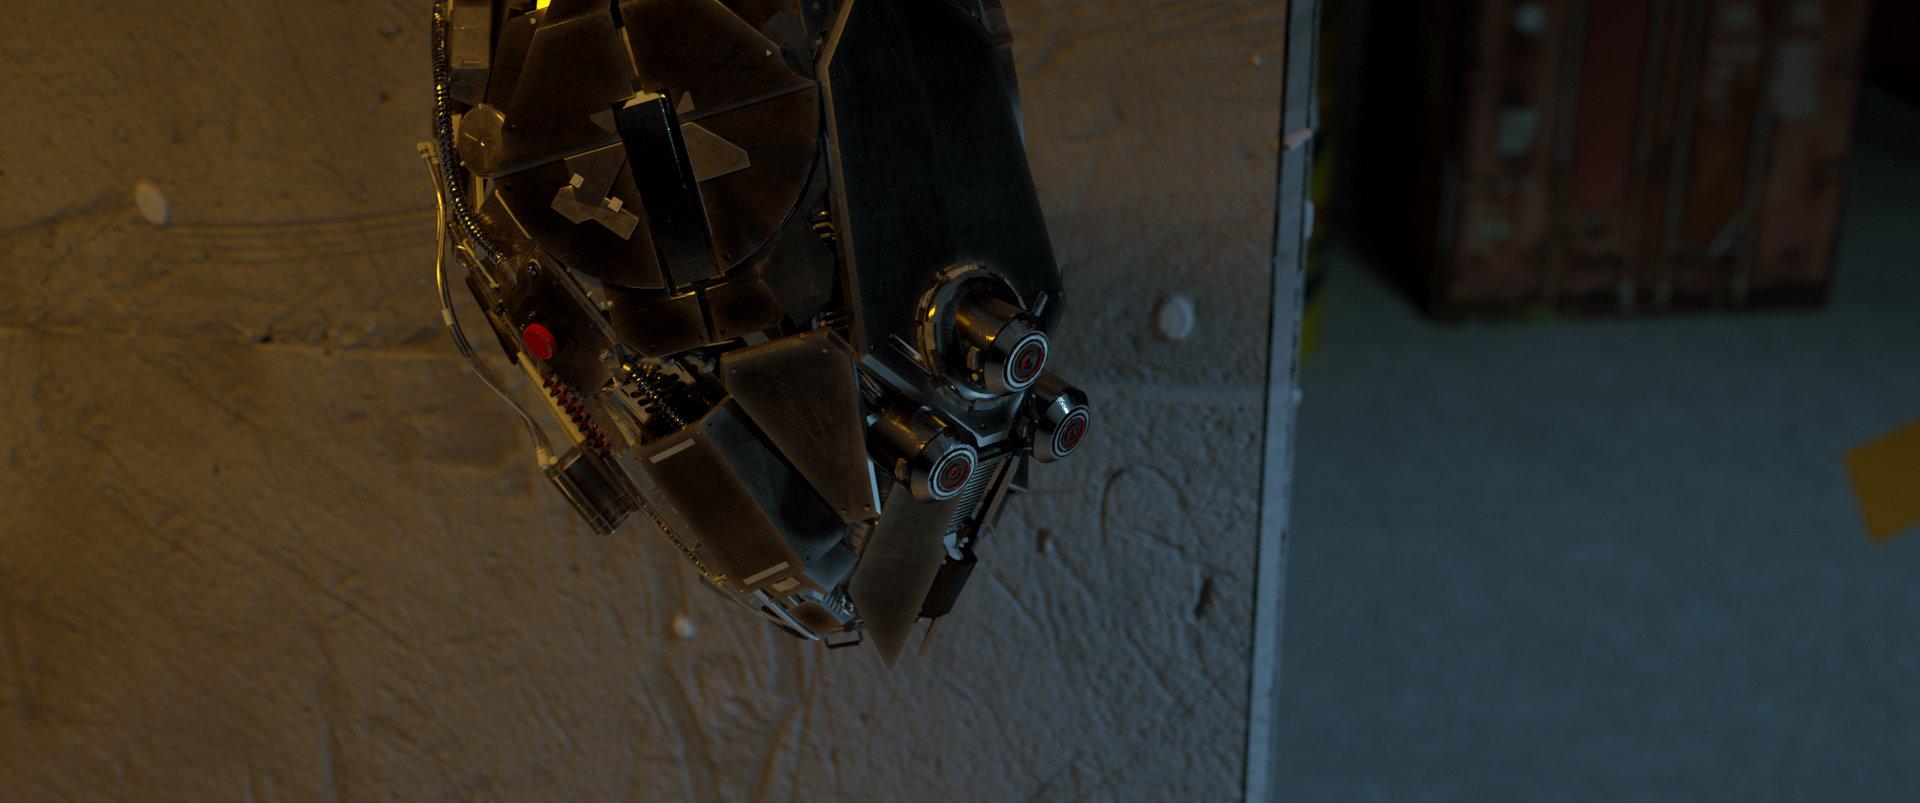 Mark chang robot vector scene